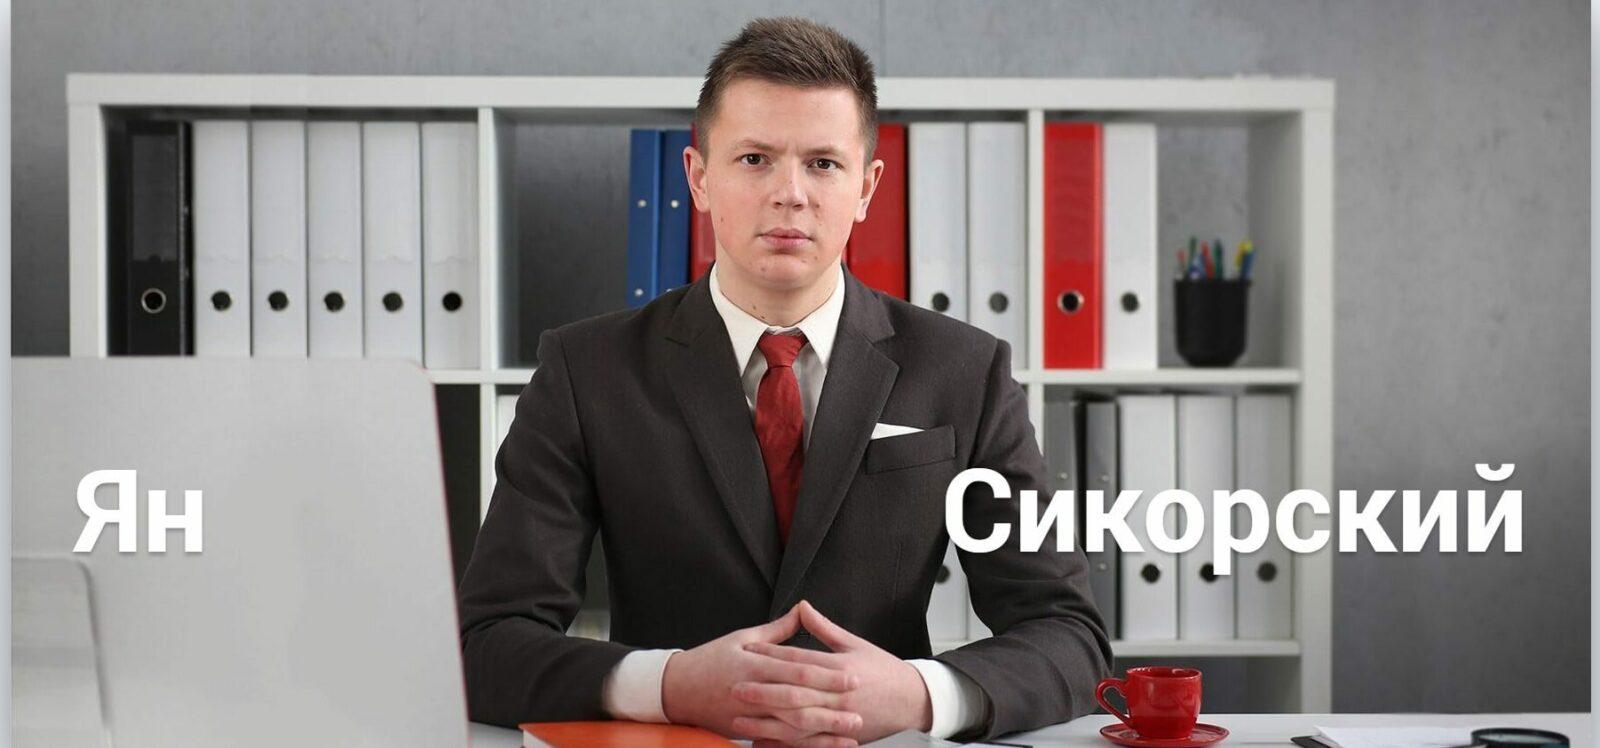 Трейдер Ян Сикорский